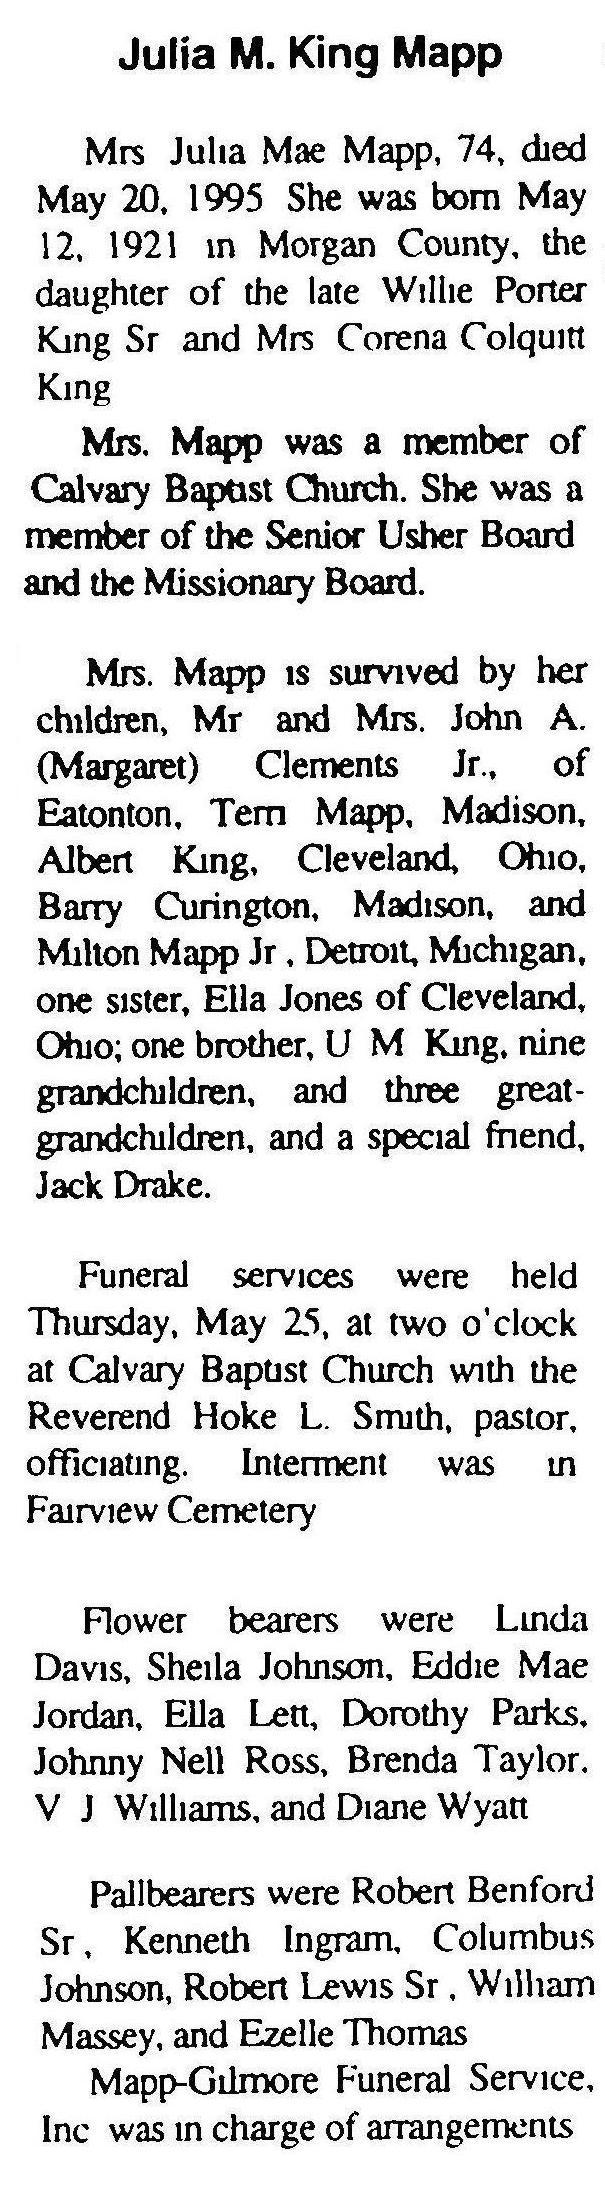 mapp_juliamaeking-1995-obituary.jpeg